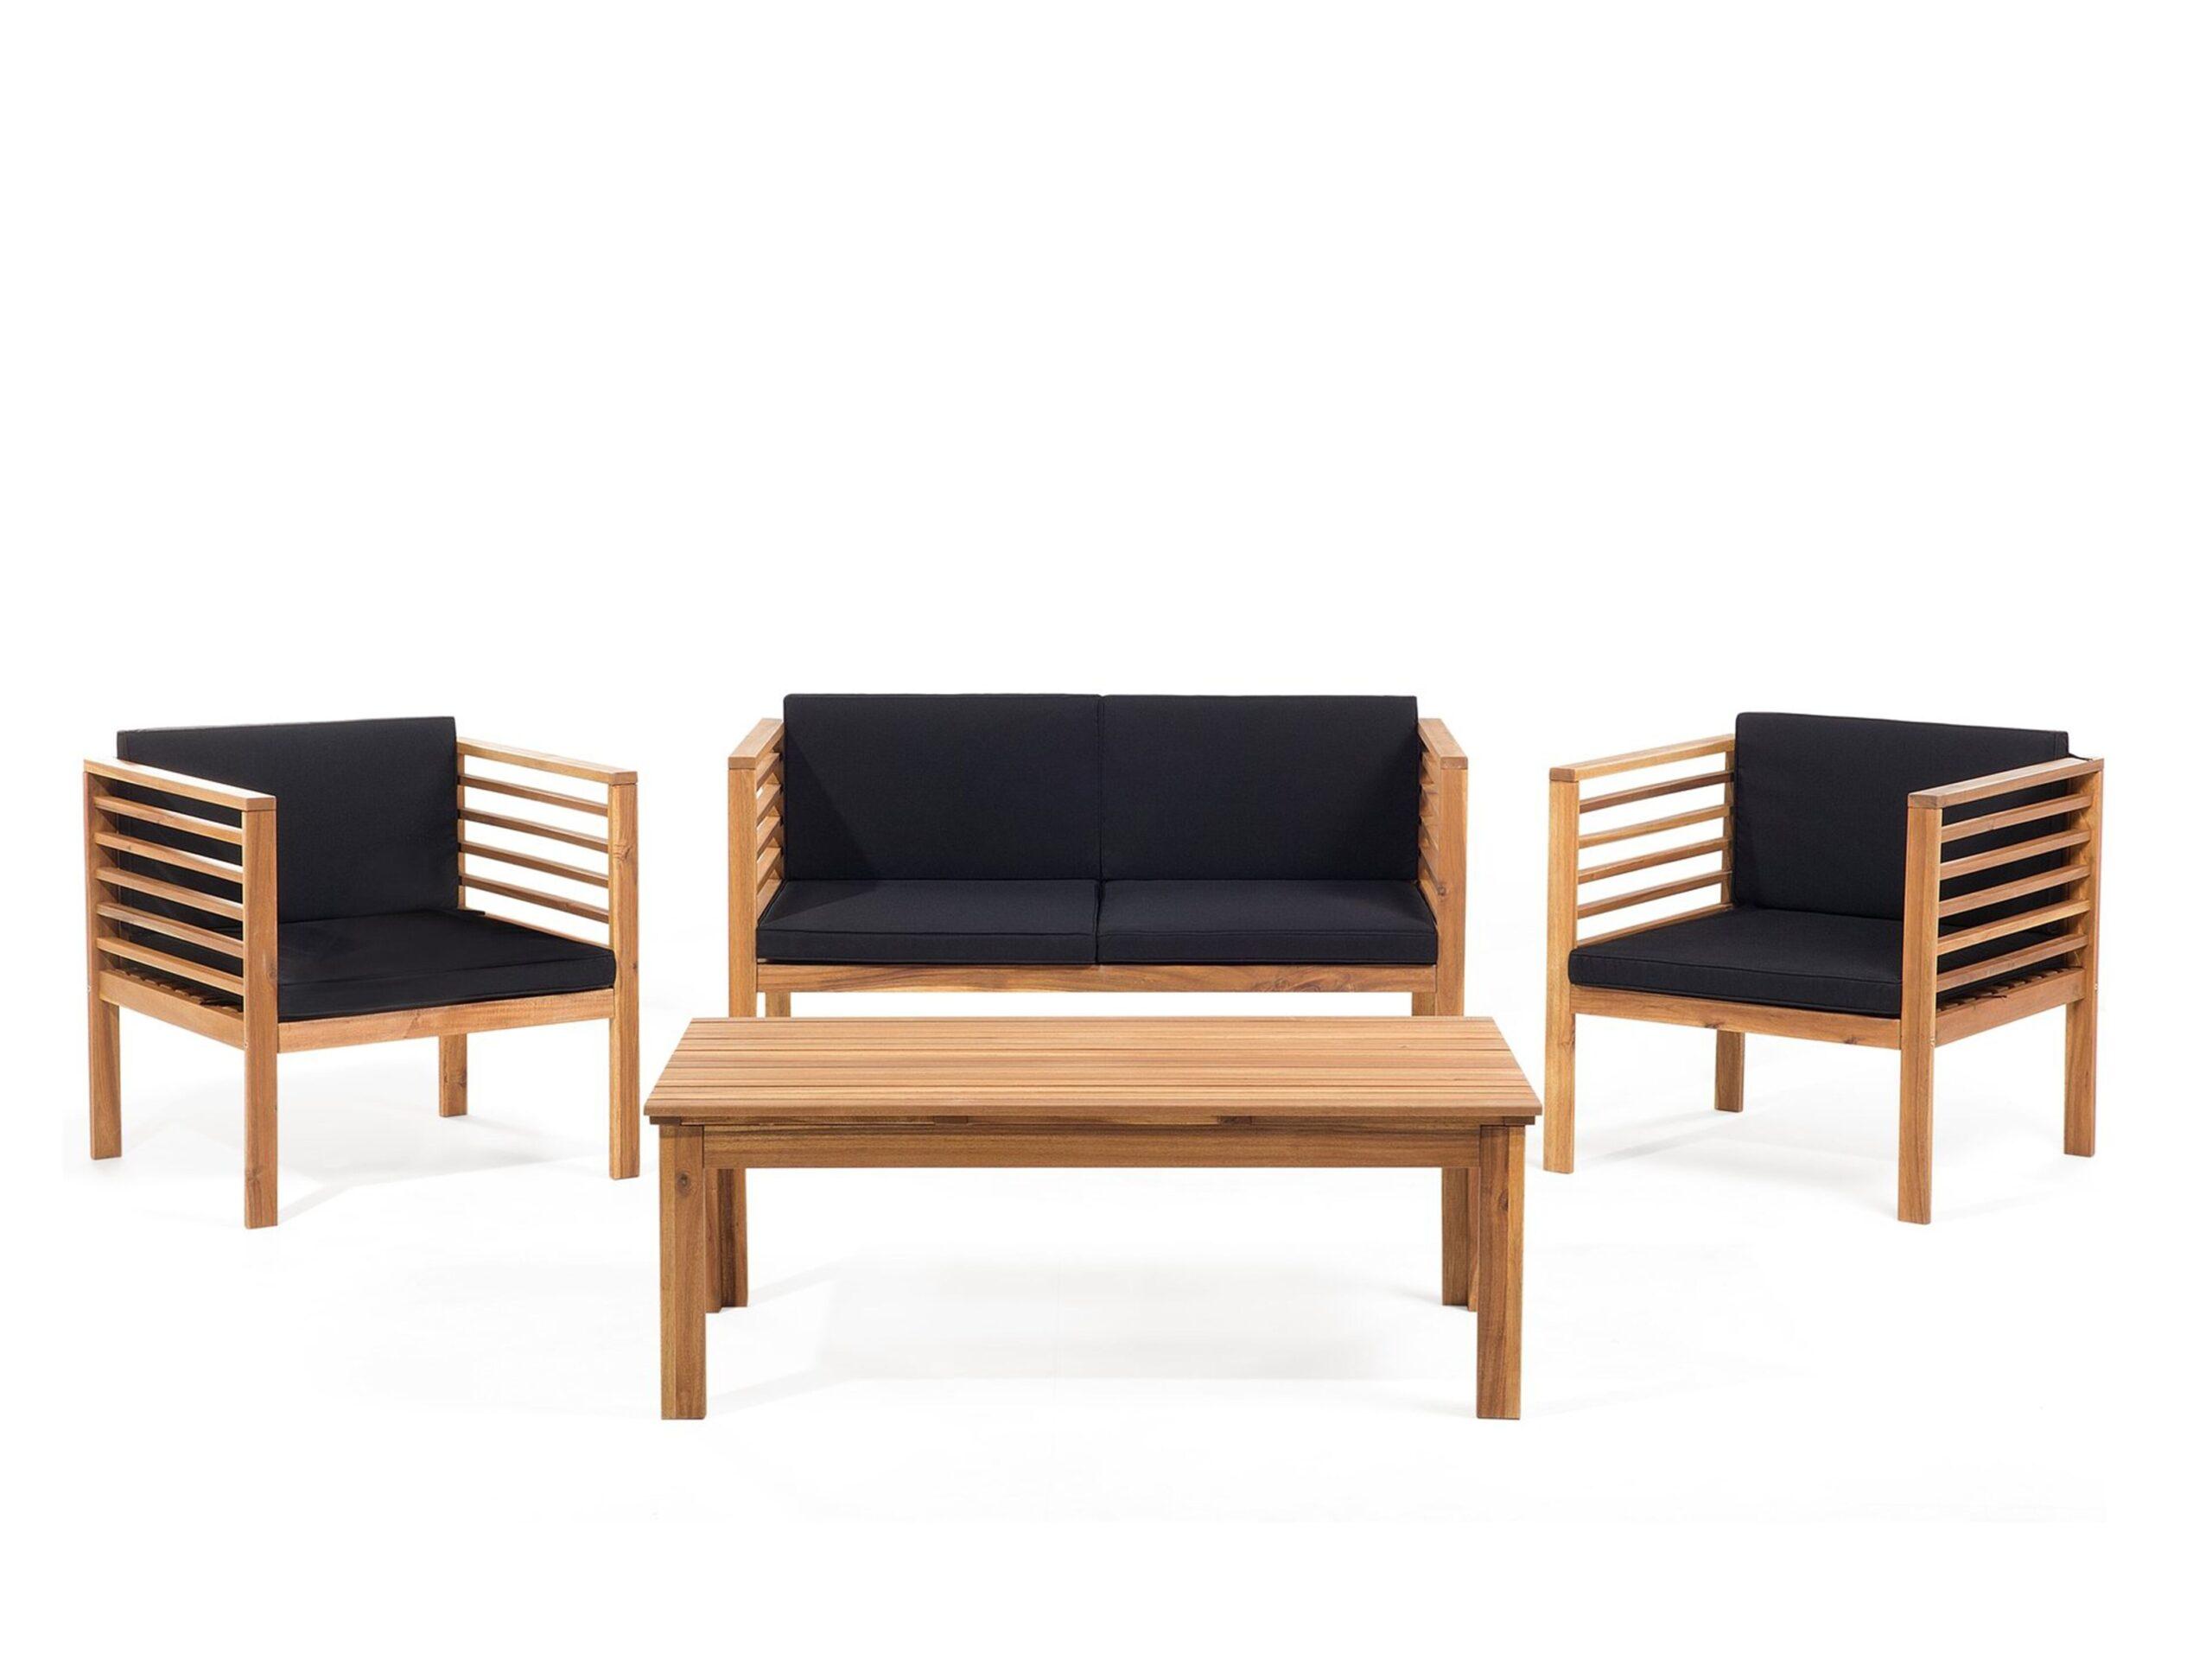 Full Size of Loungemobel Holz Caseconradcom Wohnzimmer Outliv Odense